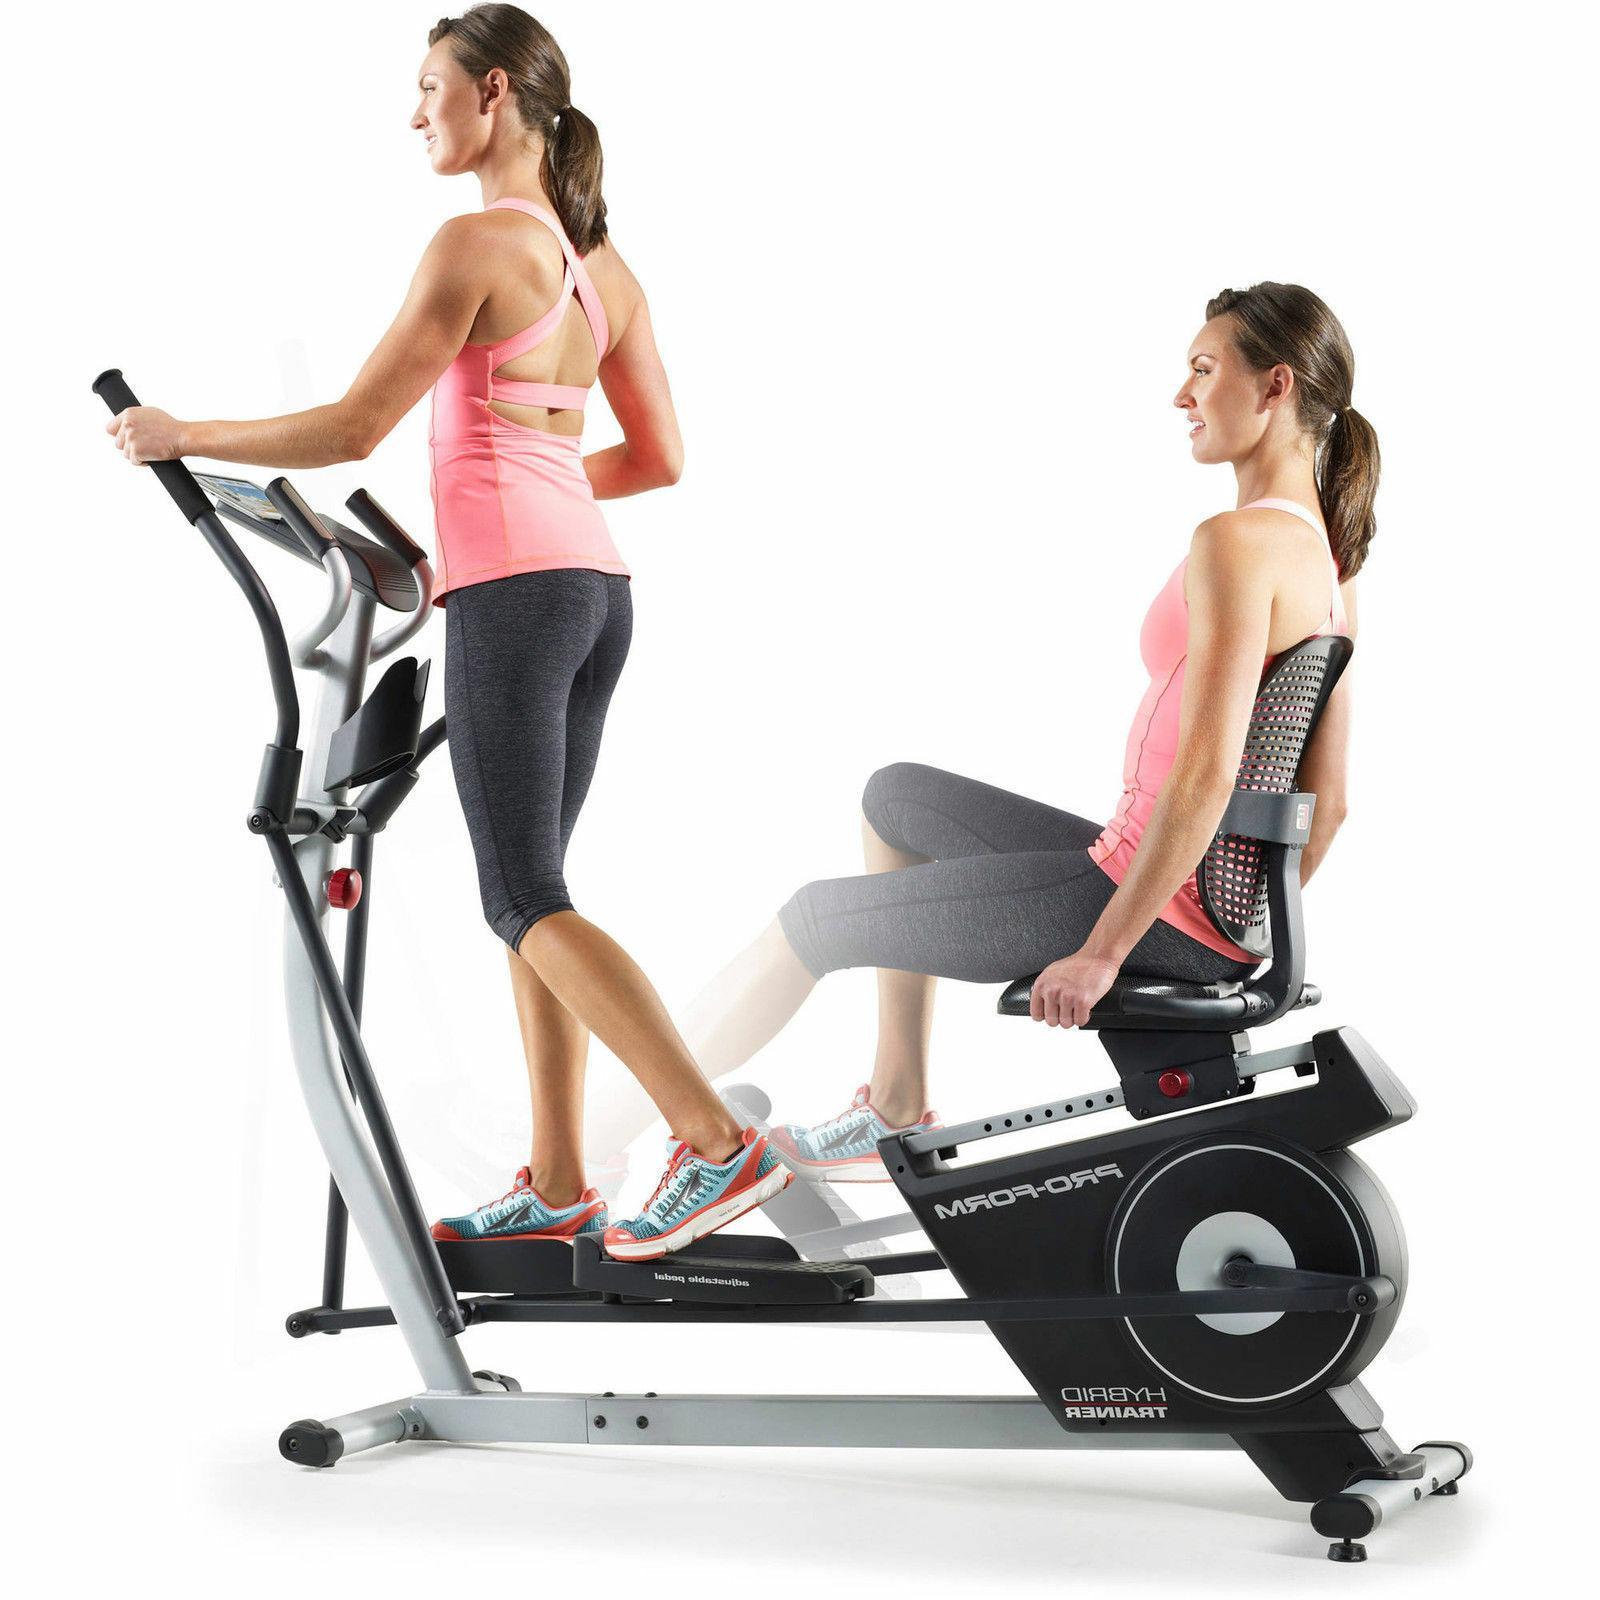 New ProForm Elliptical Cardio Exercise Delivery